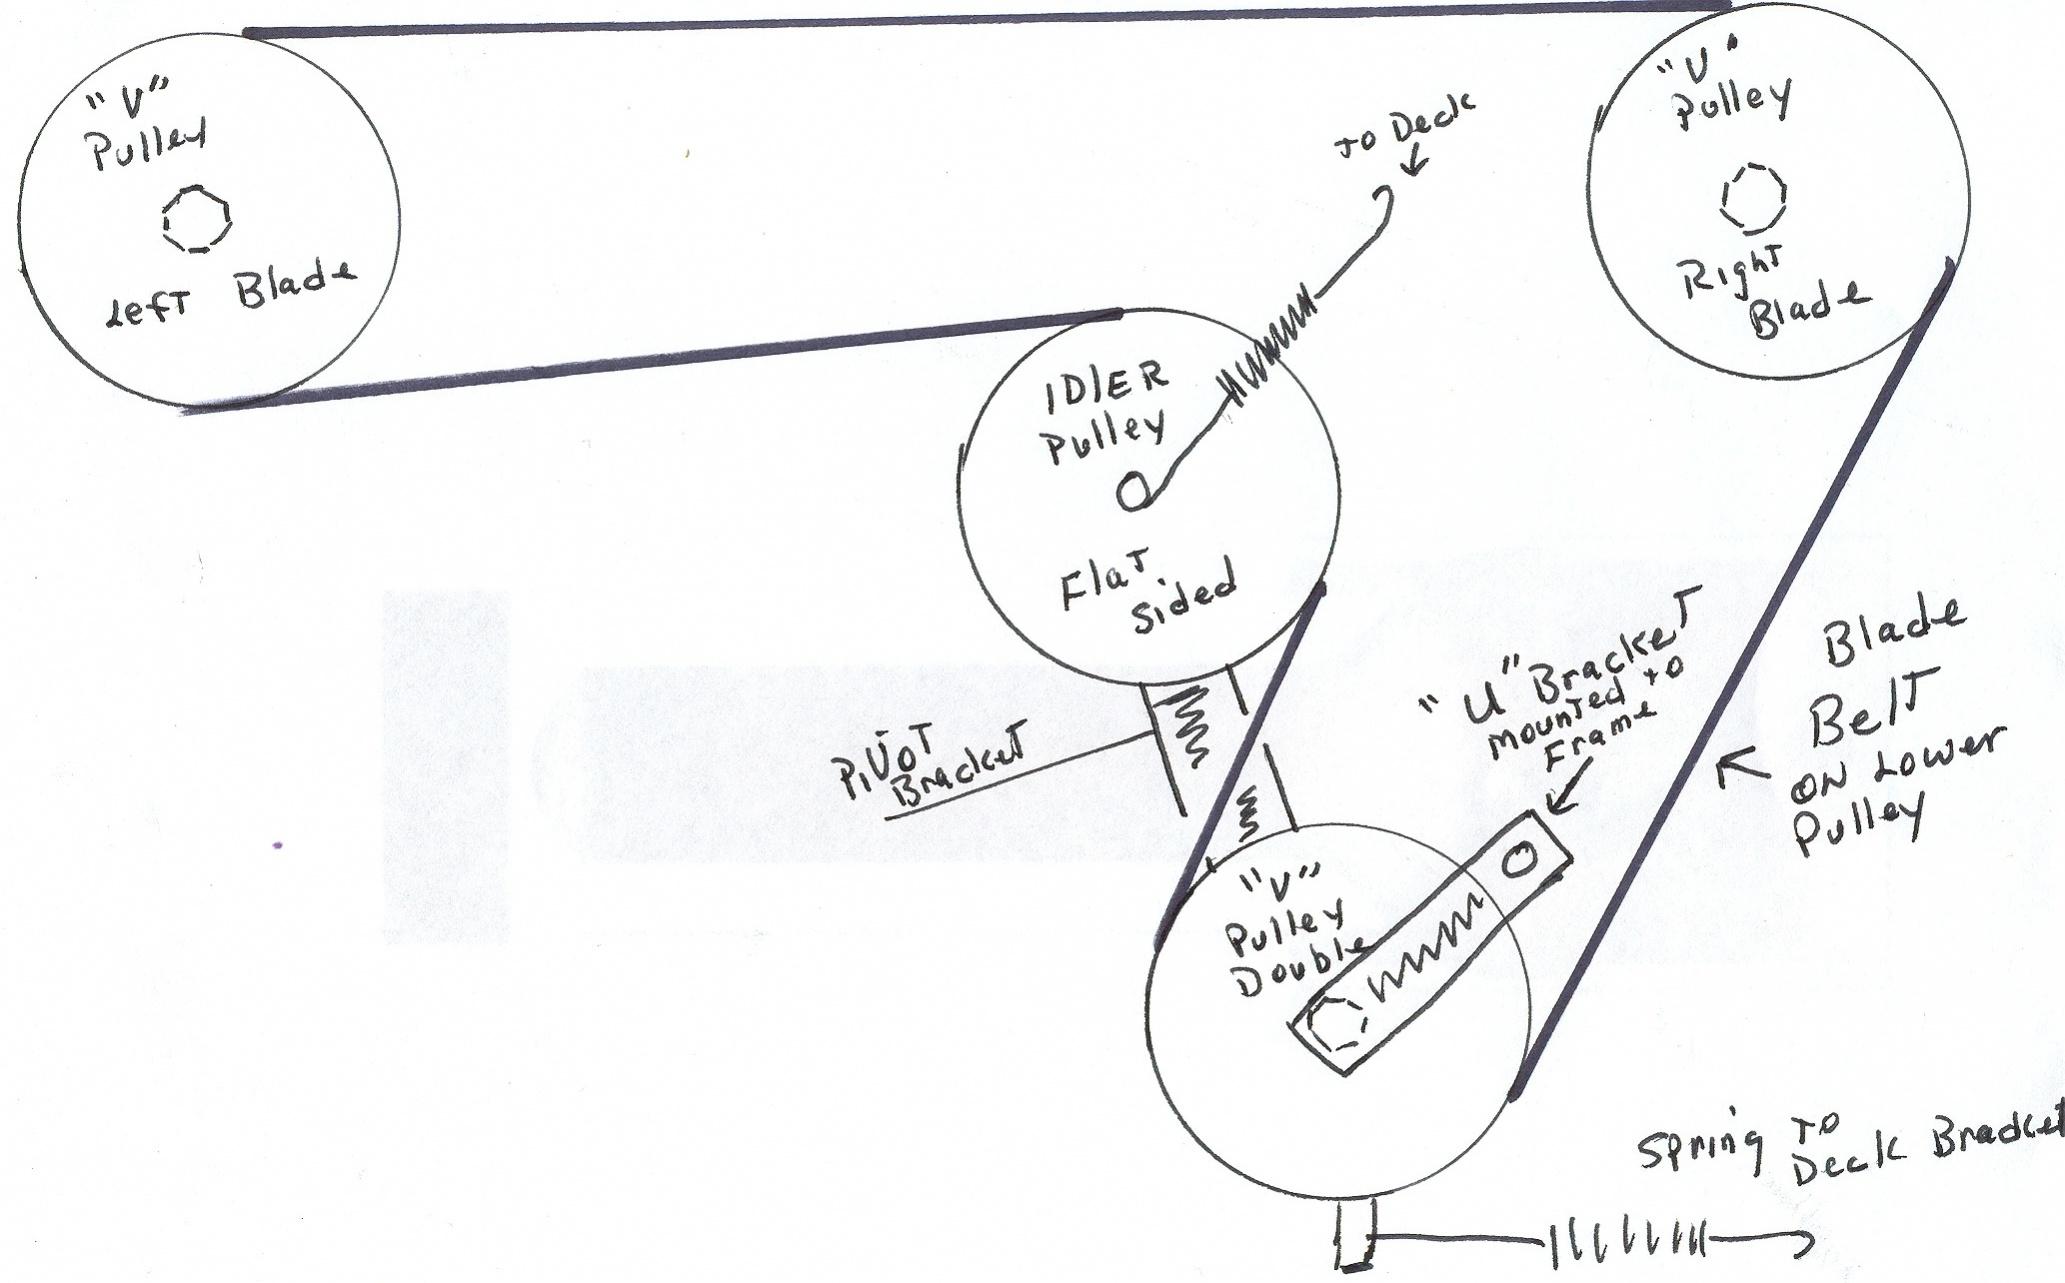 Wiring Database 2020: 28 John Deere Stx 38 Belt Diagram